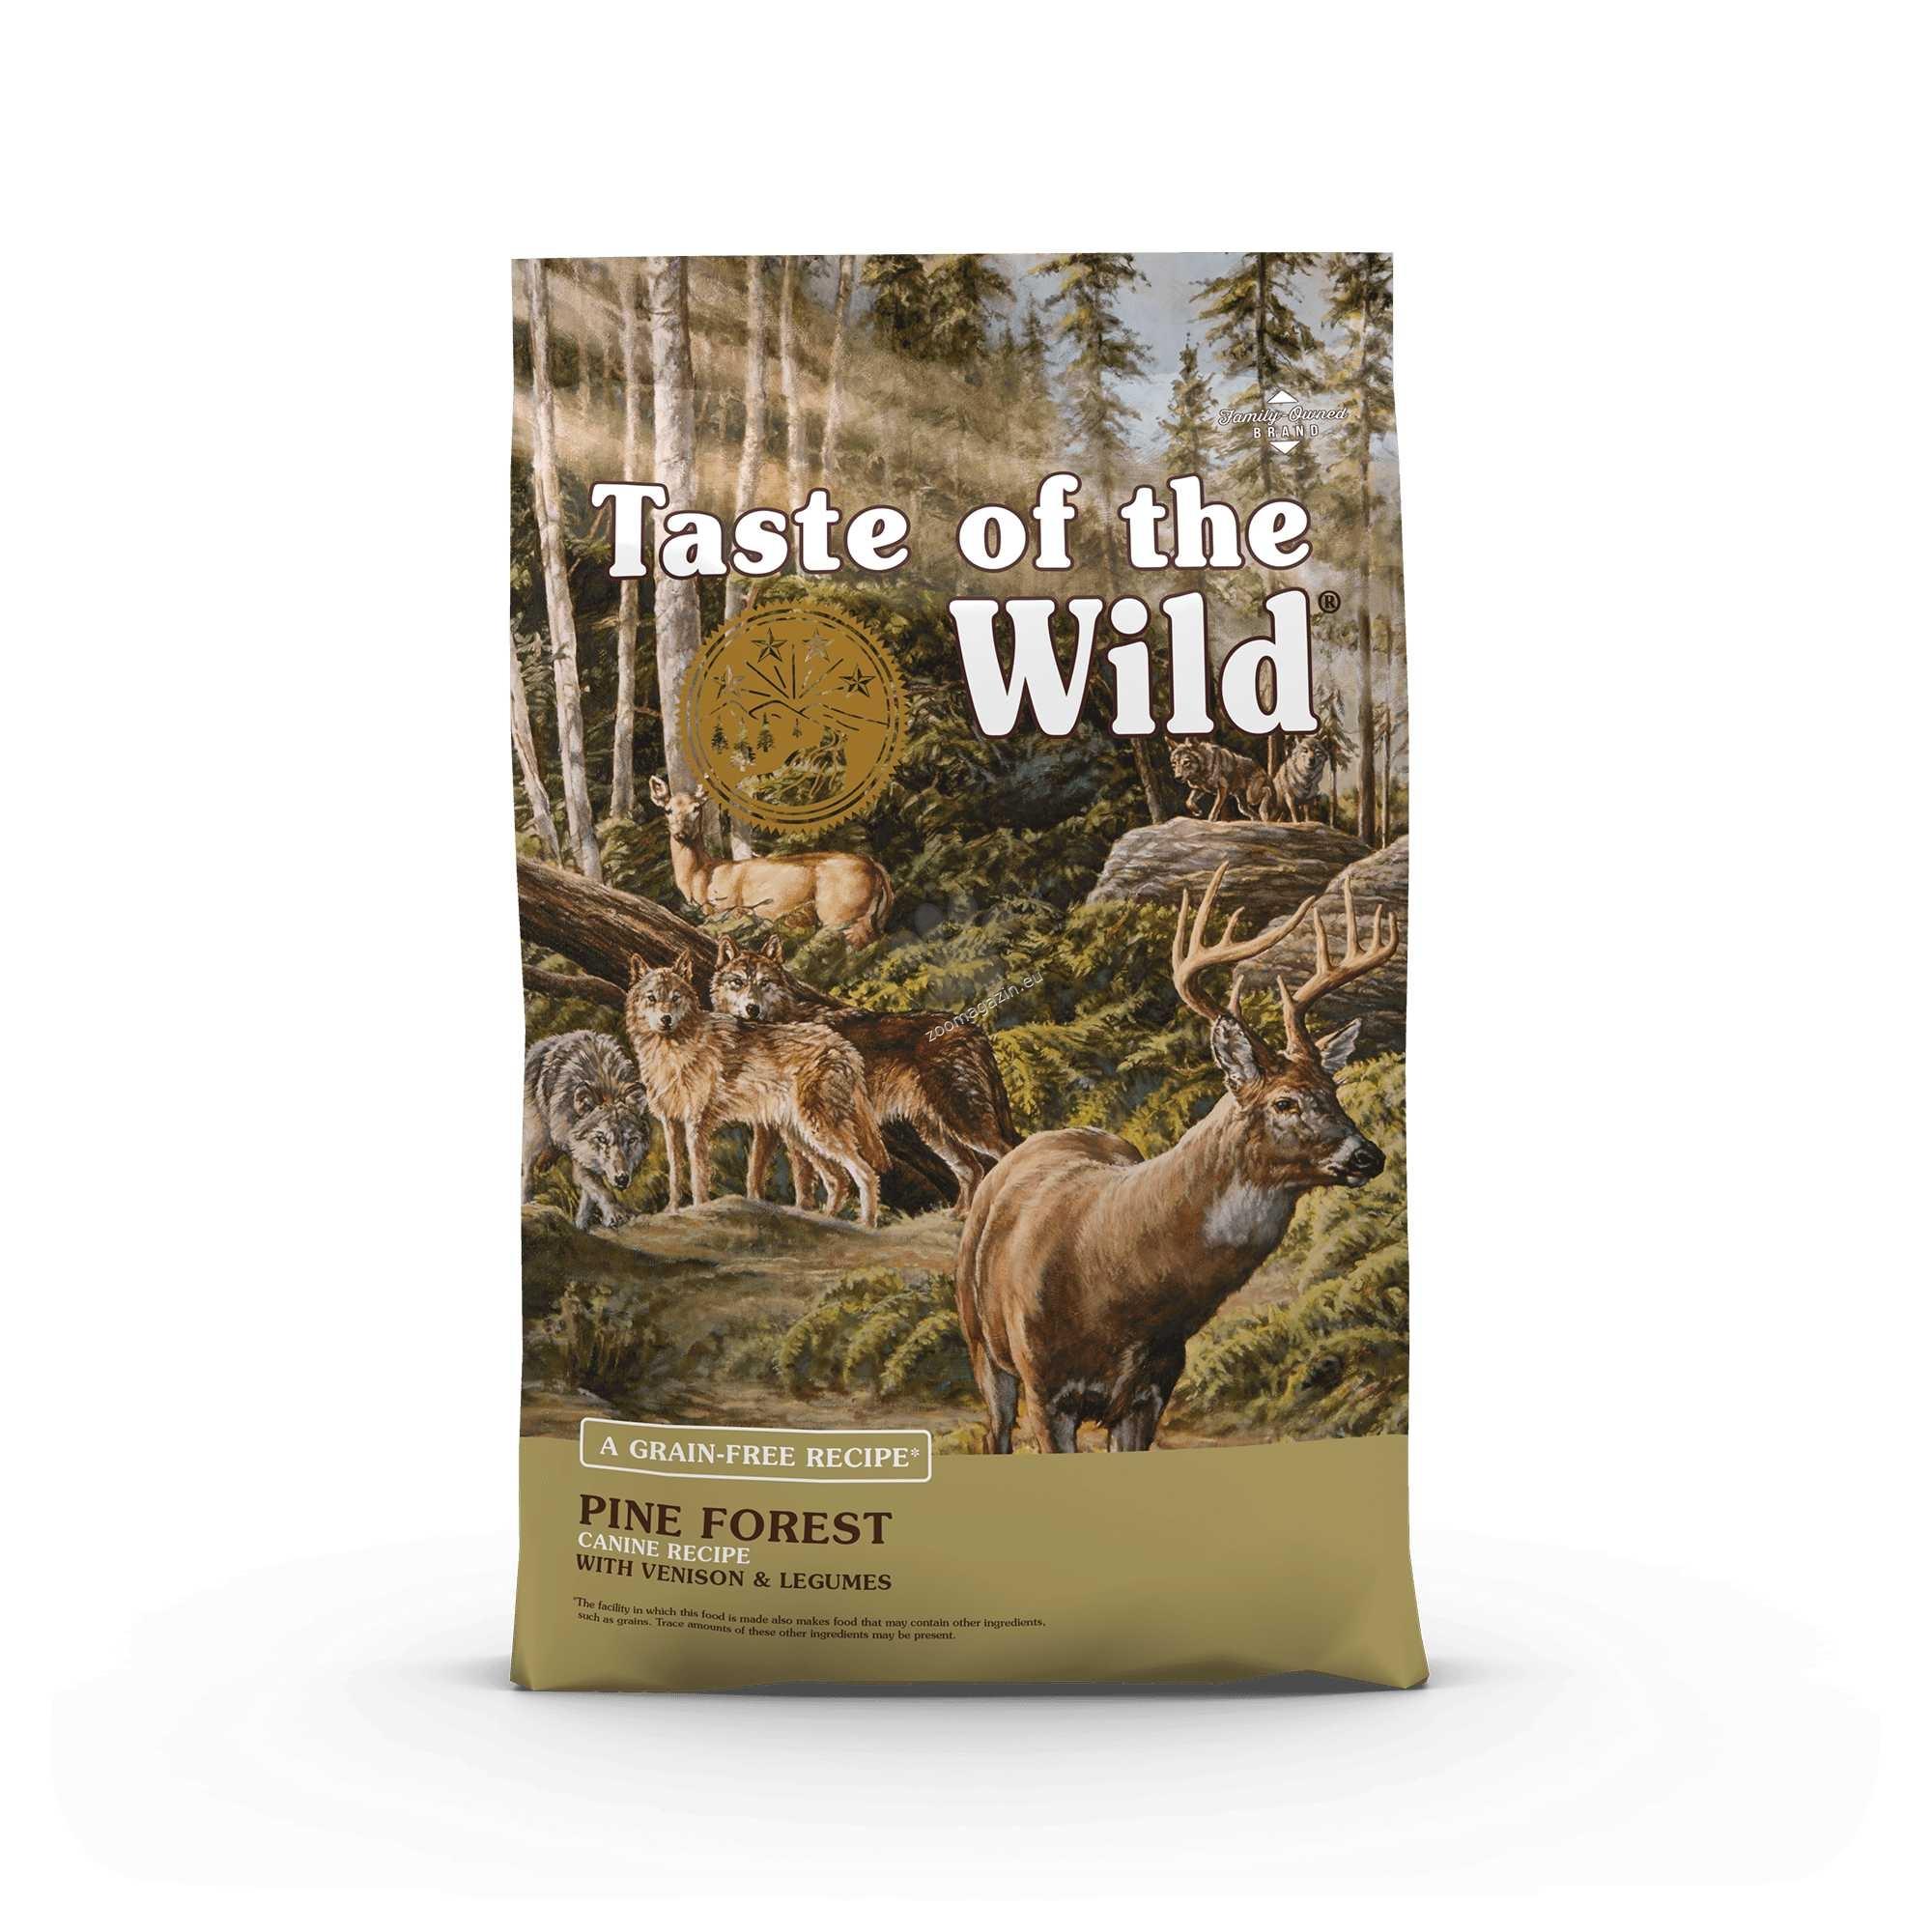 Taste of the Wild Pine Forest Canine Recipe with Venison & Legumes - с дивечово, агнешко месо и бобови растения 12.2 кг.